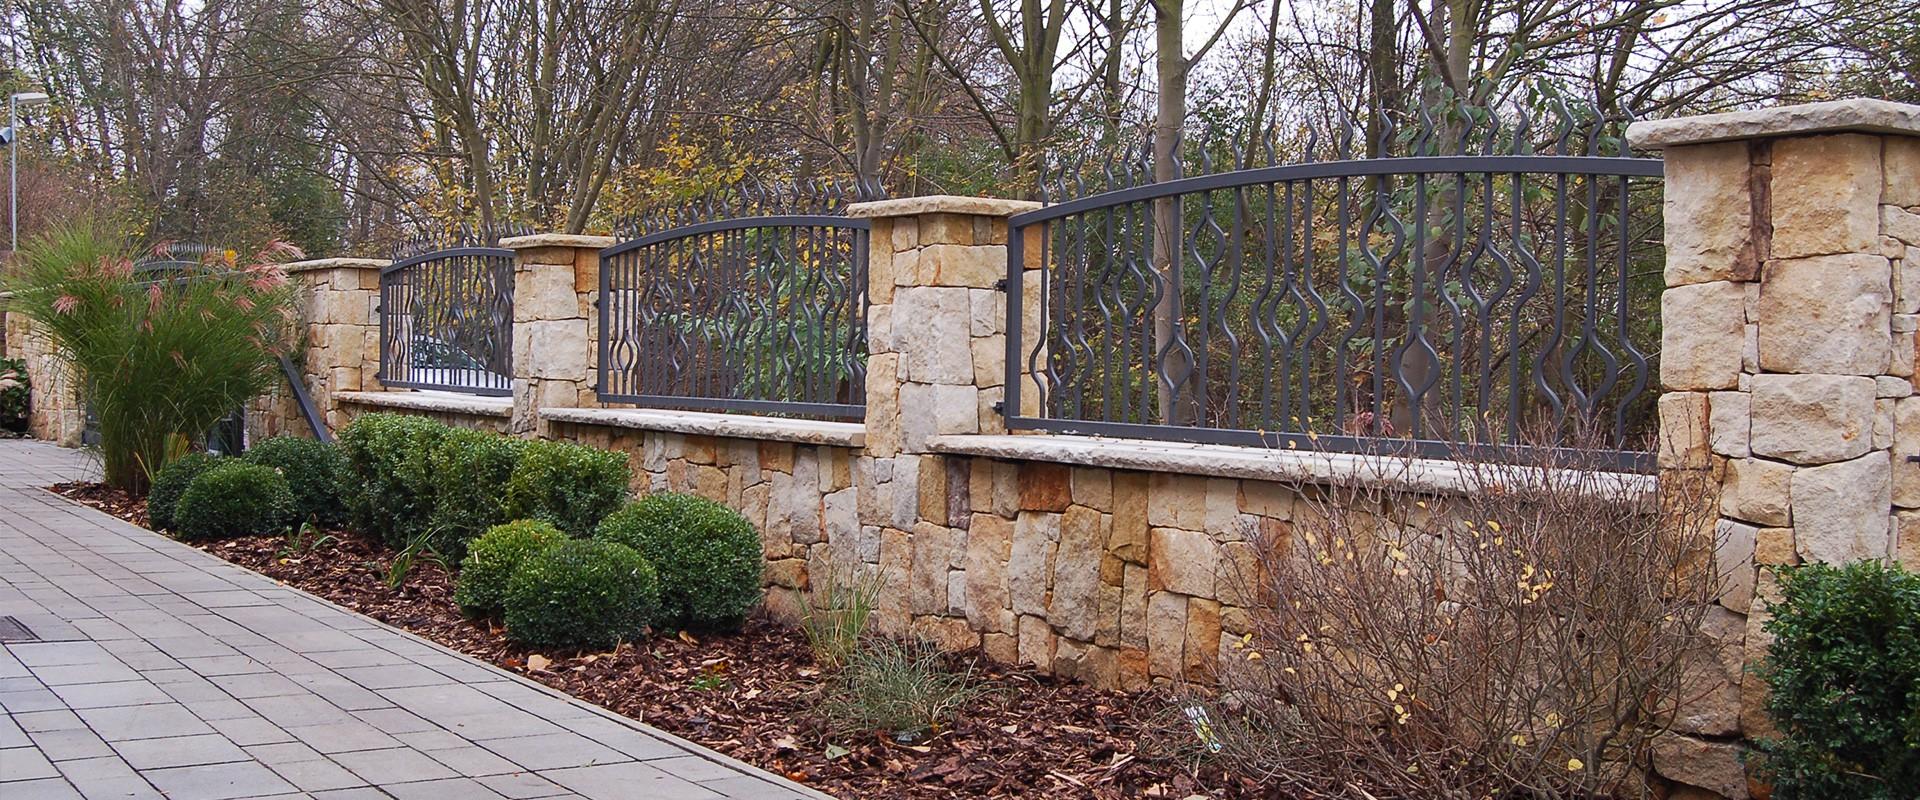 Kamenné ploty